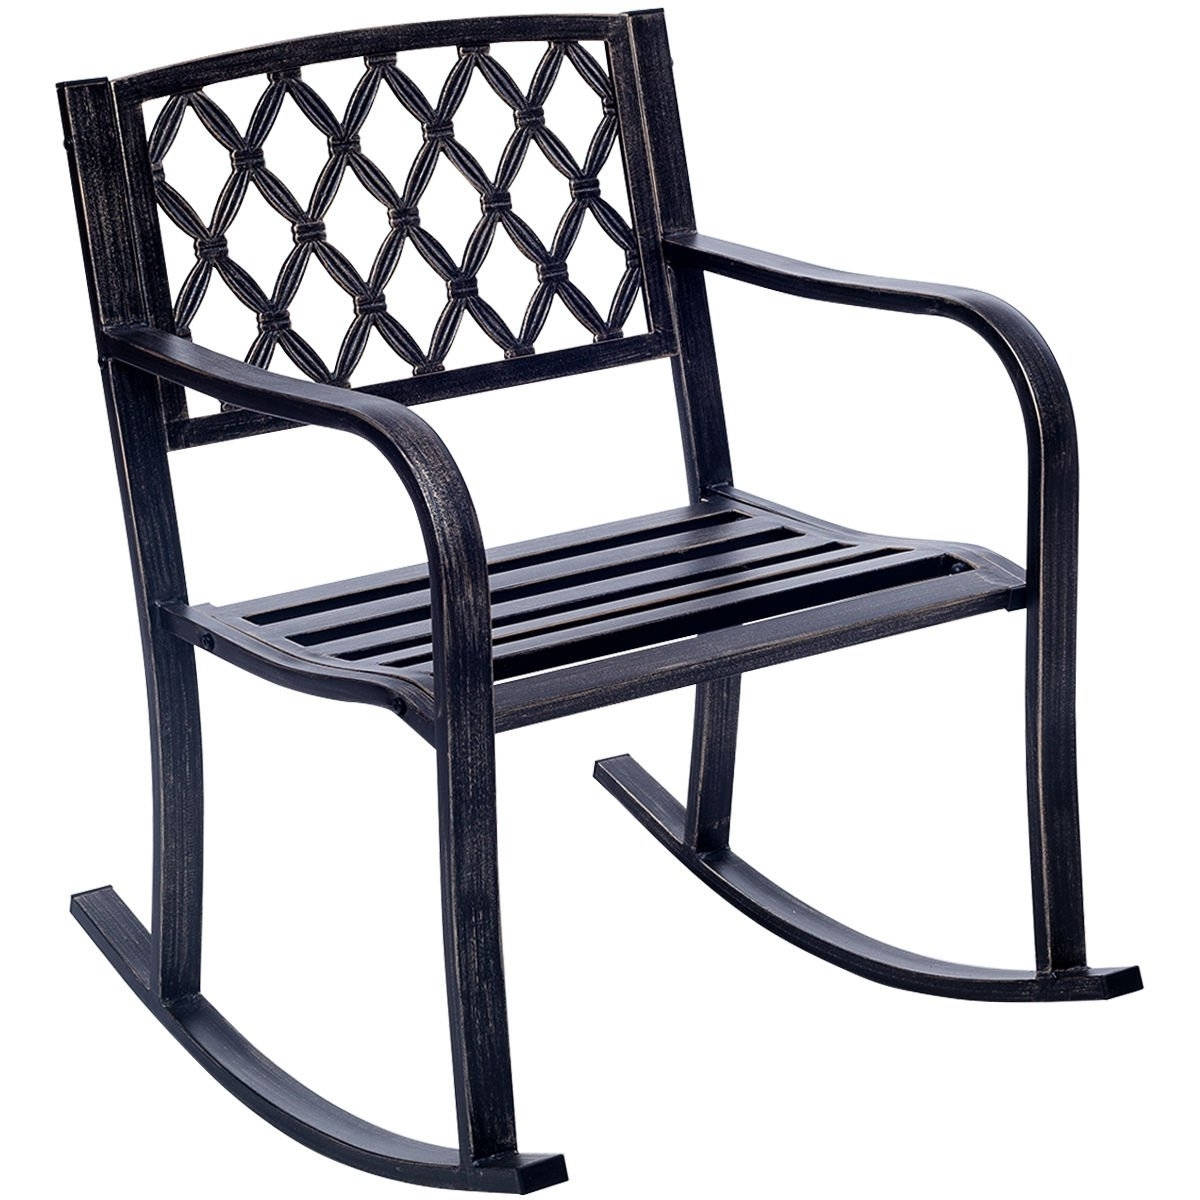 Most Popular Outdoor Patio Metal Rocking Chairs Pertaining To Giantex Patio Metal Rocking Chair Porch Seat Deck Outdoor Backyard (View 12 of 15)